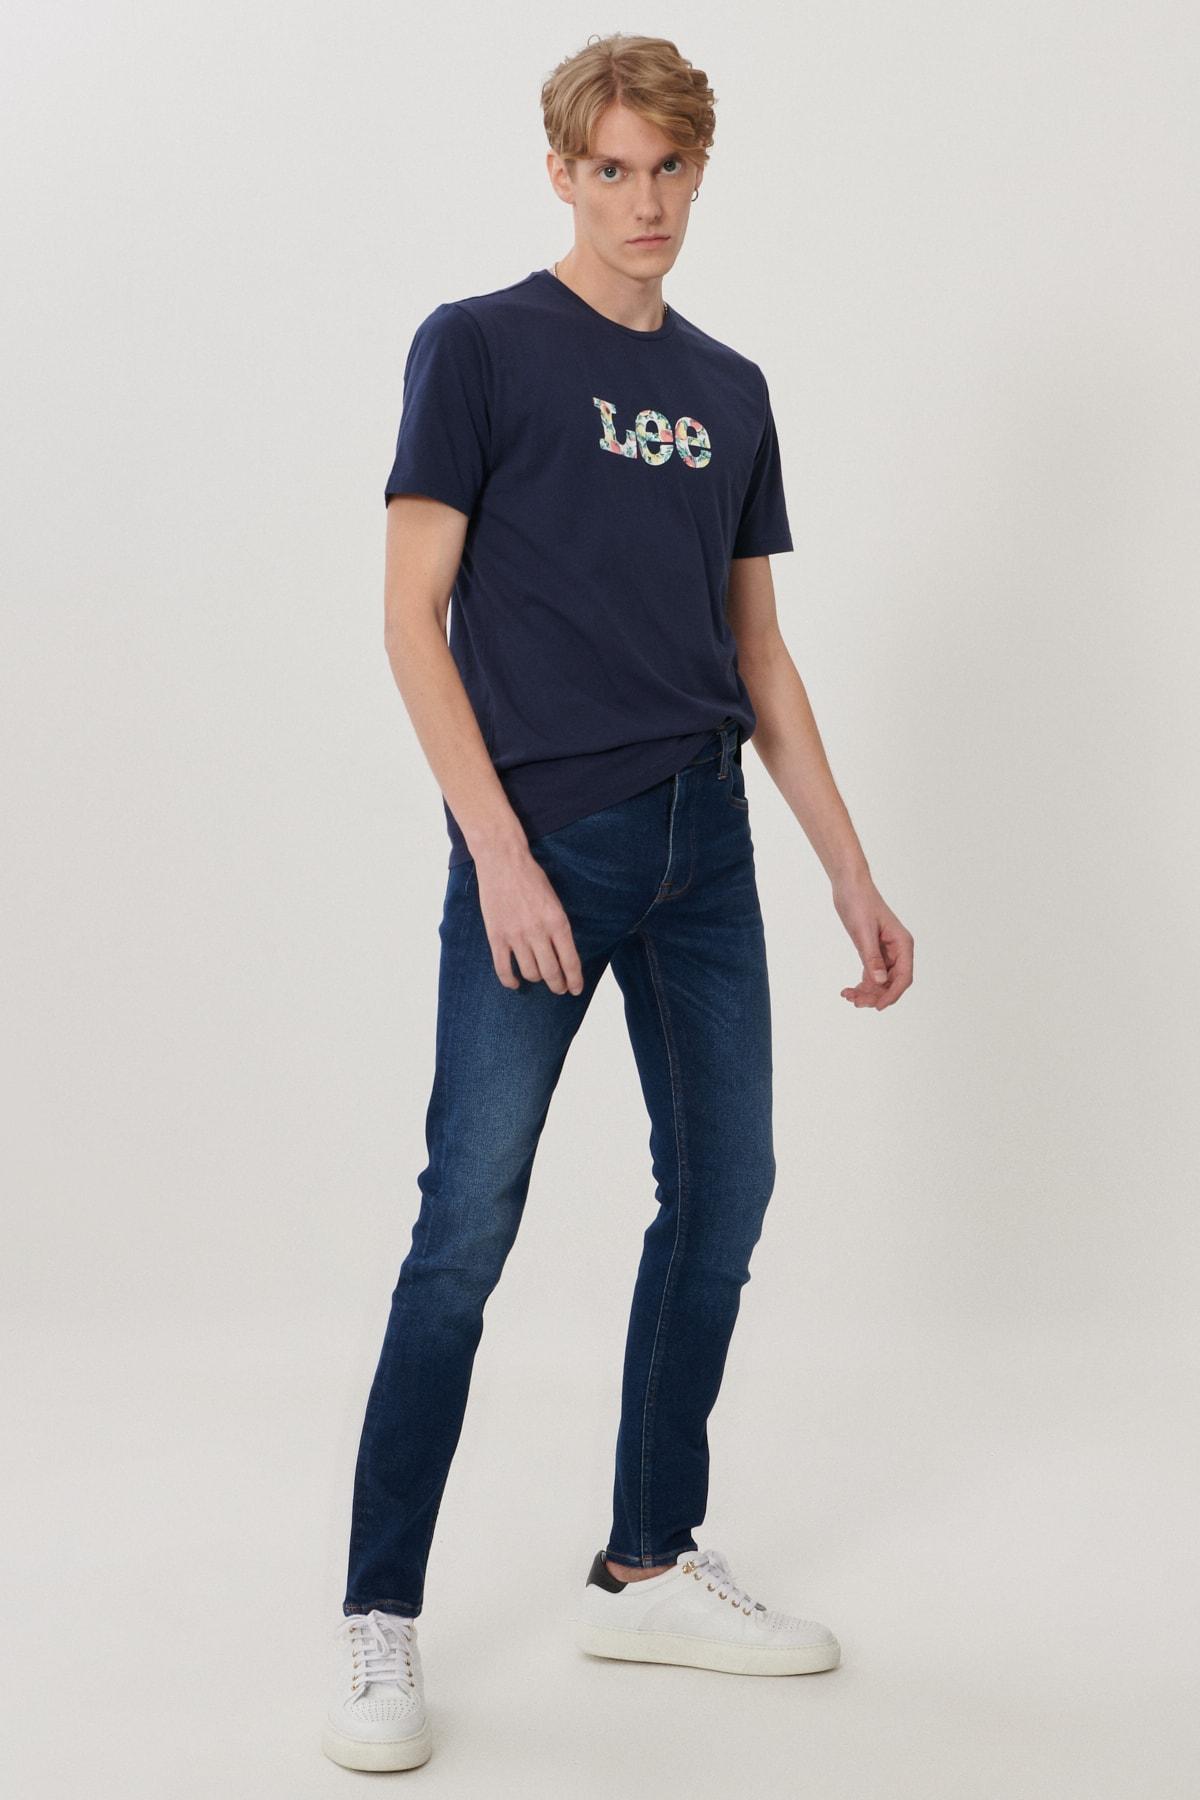 Lee Malone Erkek Koyu Mavi Skinny Normal Bel Çok Dar Paça Esnek Jean Pantolon